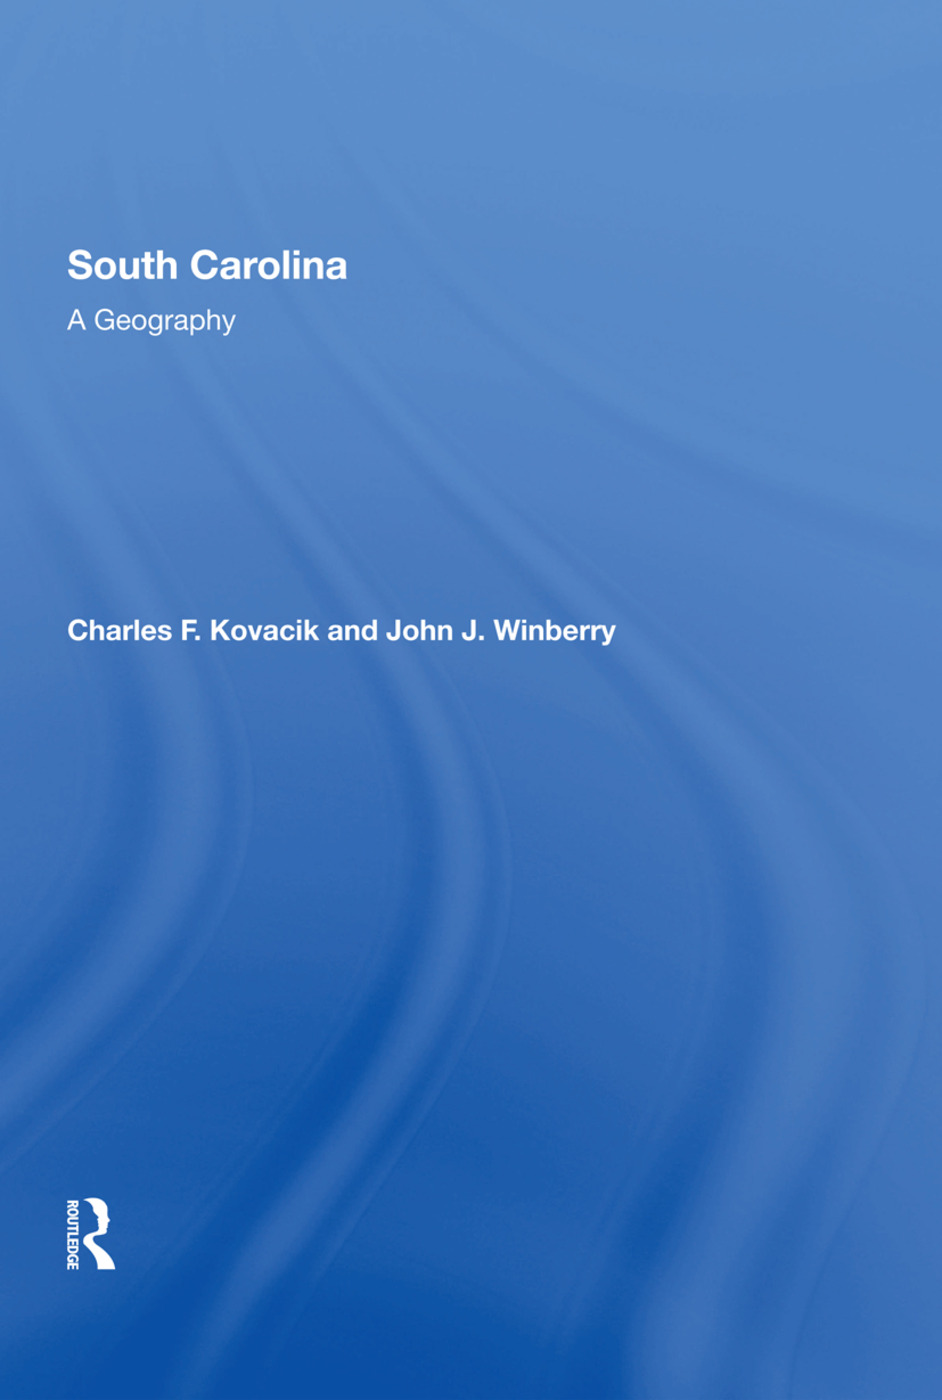 South Carolina: A Geography, 1st Edition (Hardback) book cover